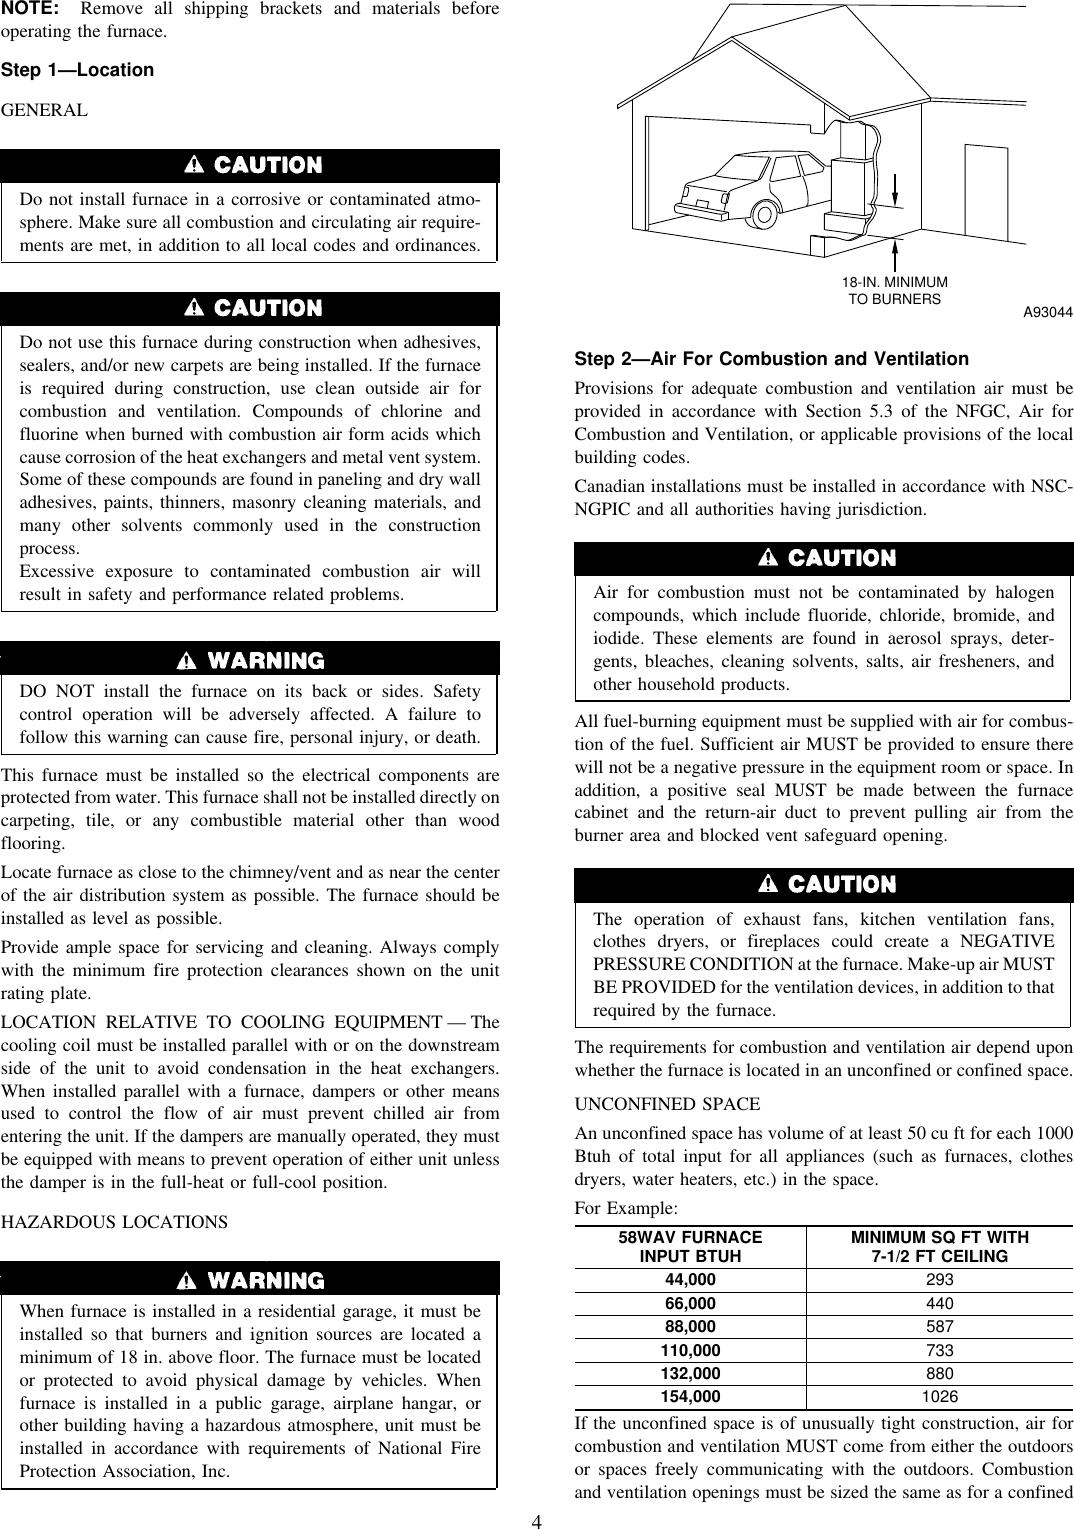 Carrier Weathermaker 8000 58Wav Owners Manual